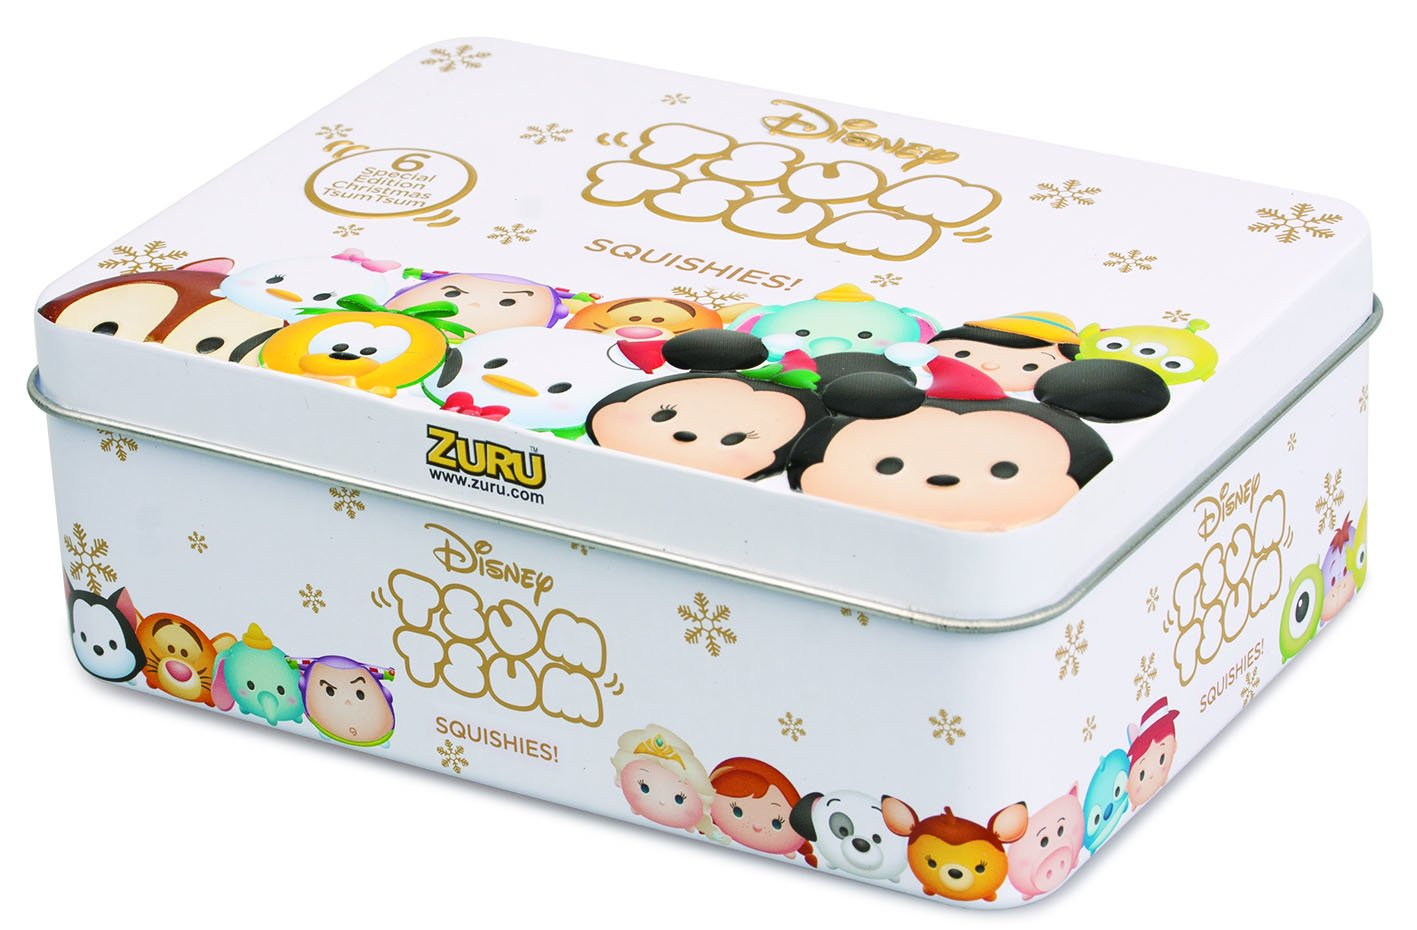 Tsum Tsum TT5860 Disney Mini Figures